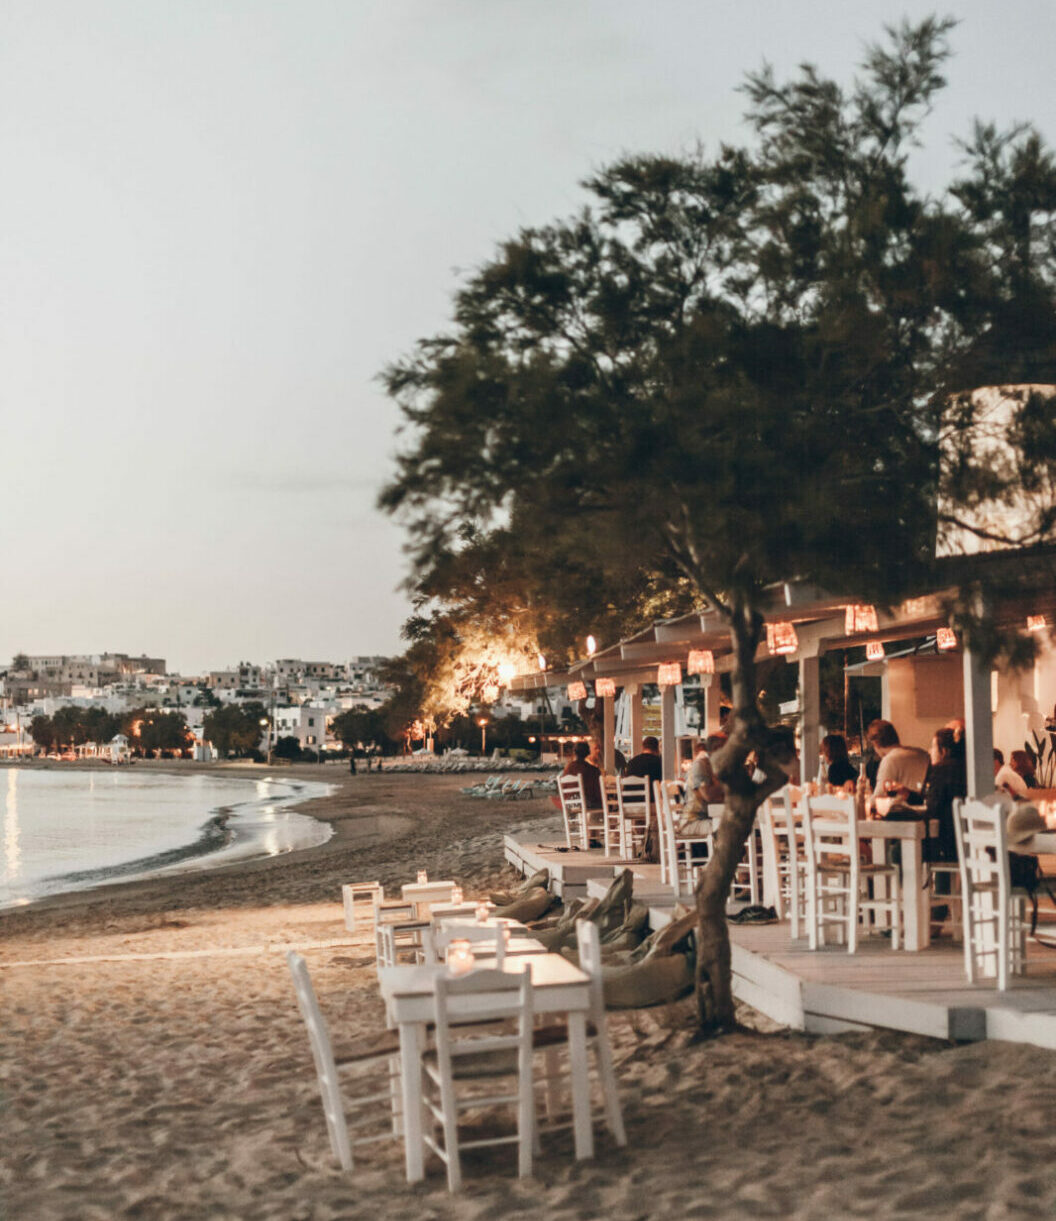 beach cafe evening flisvos sport club restaurant by the sea sunset